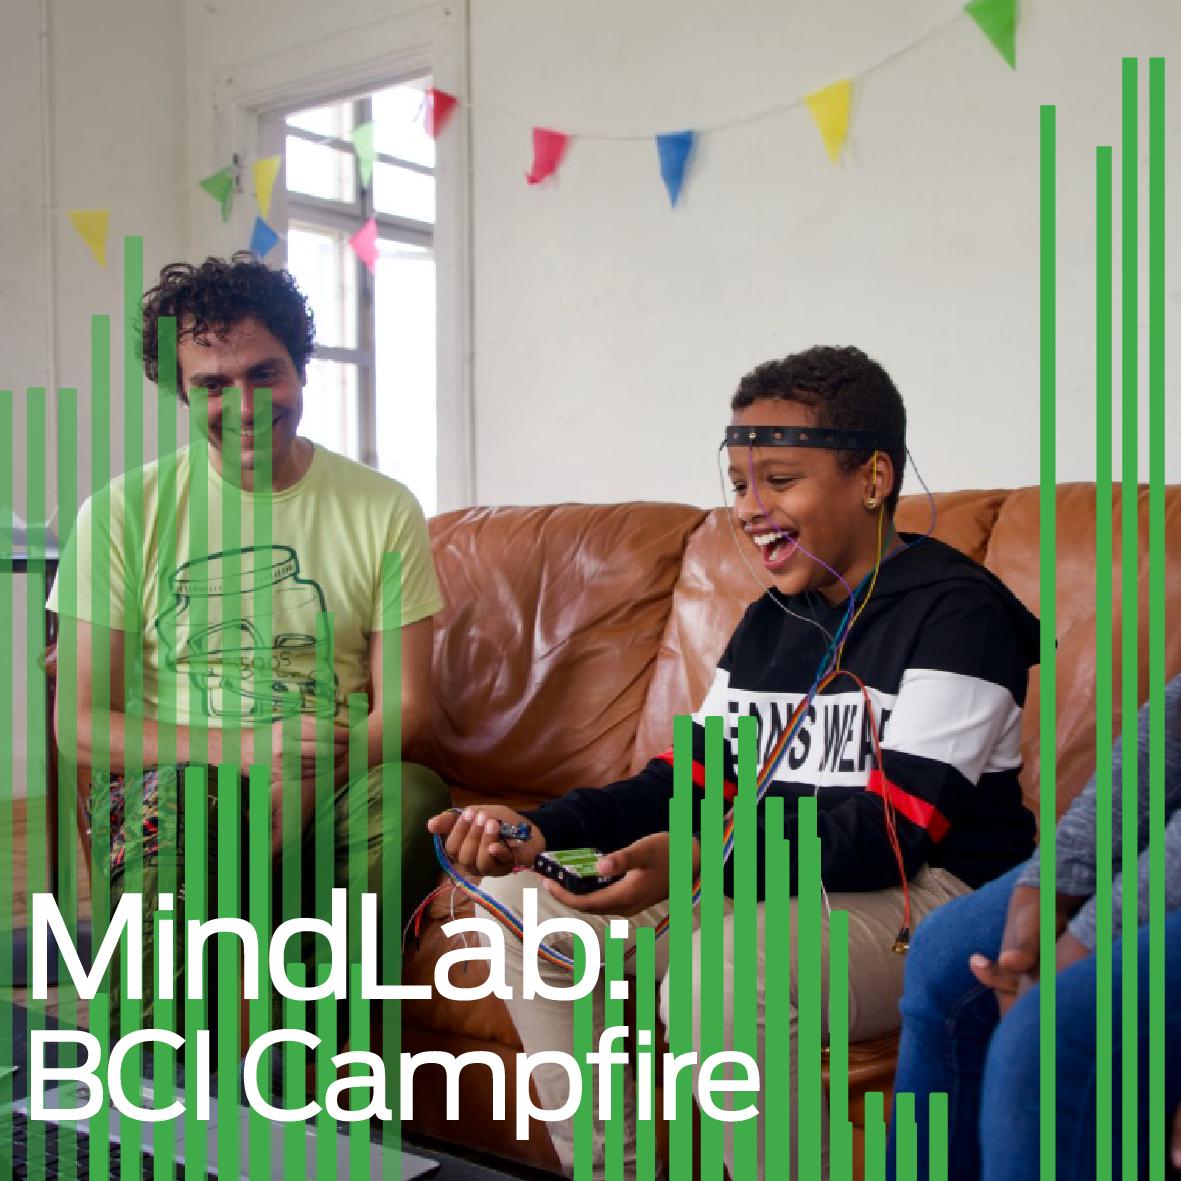 MindLab: BCI Campfire